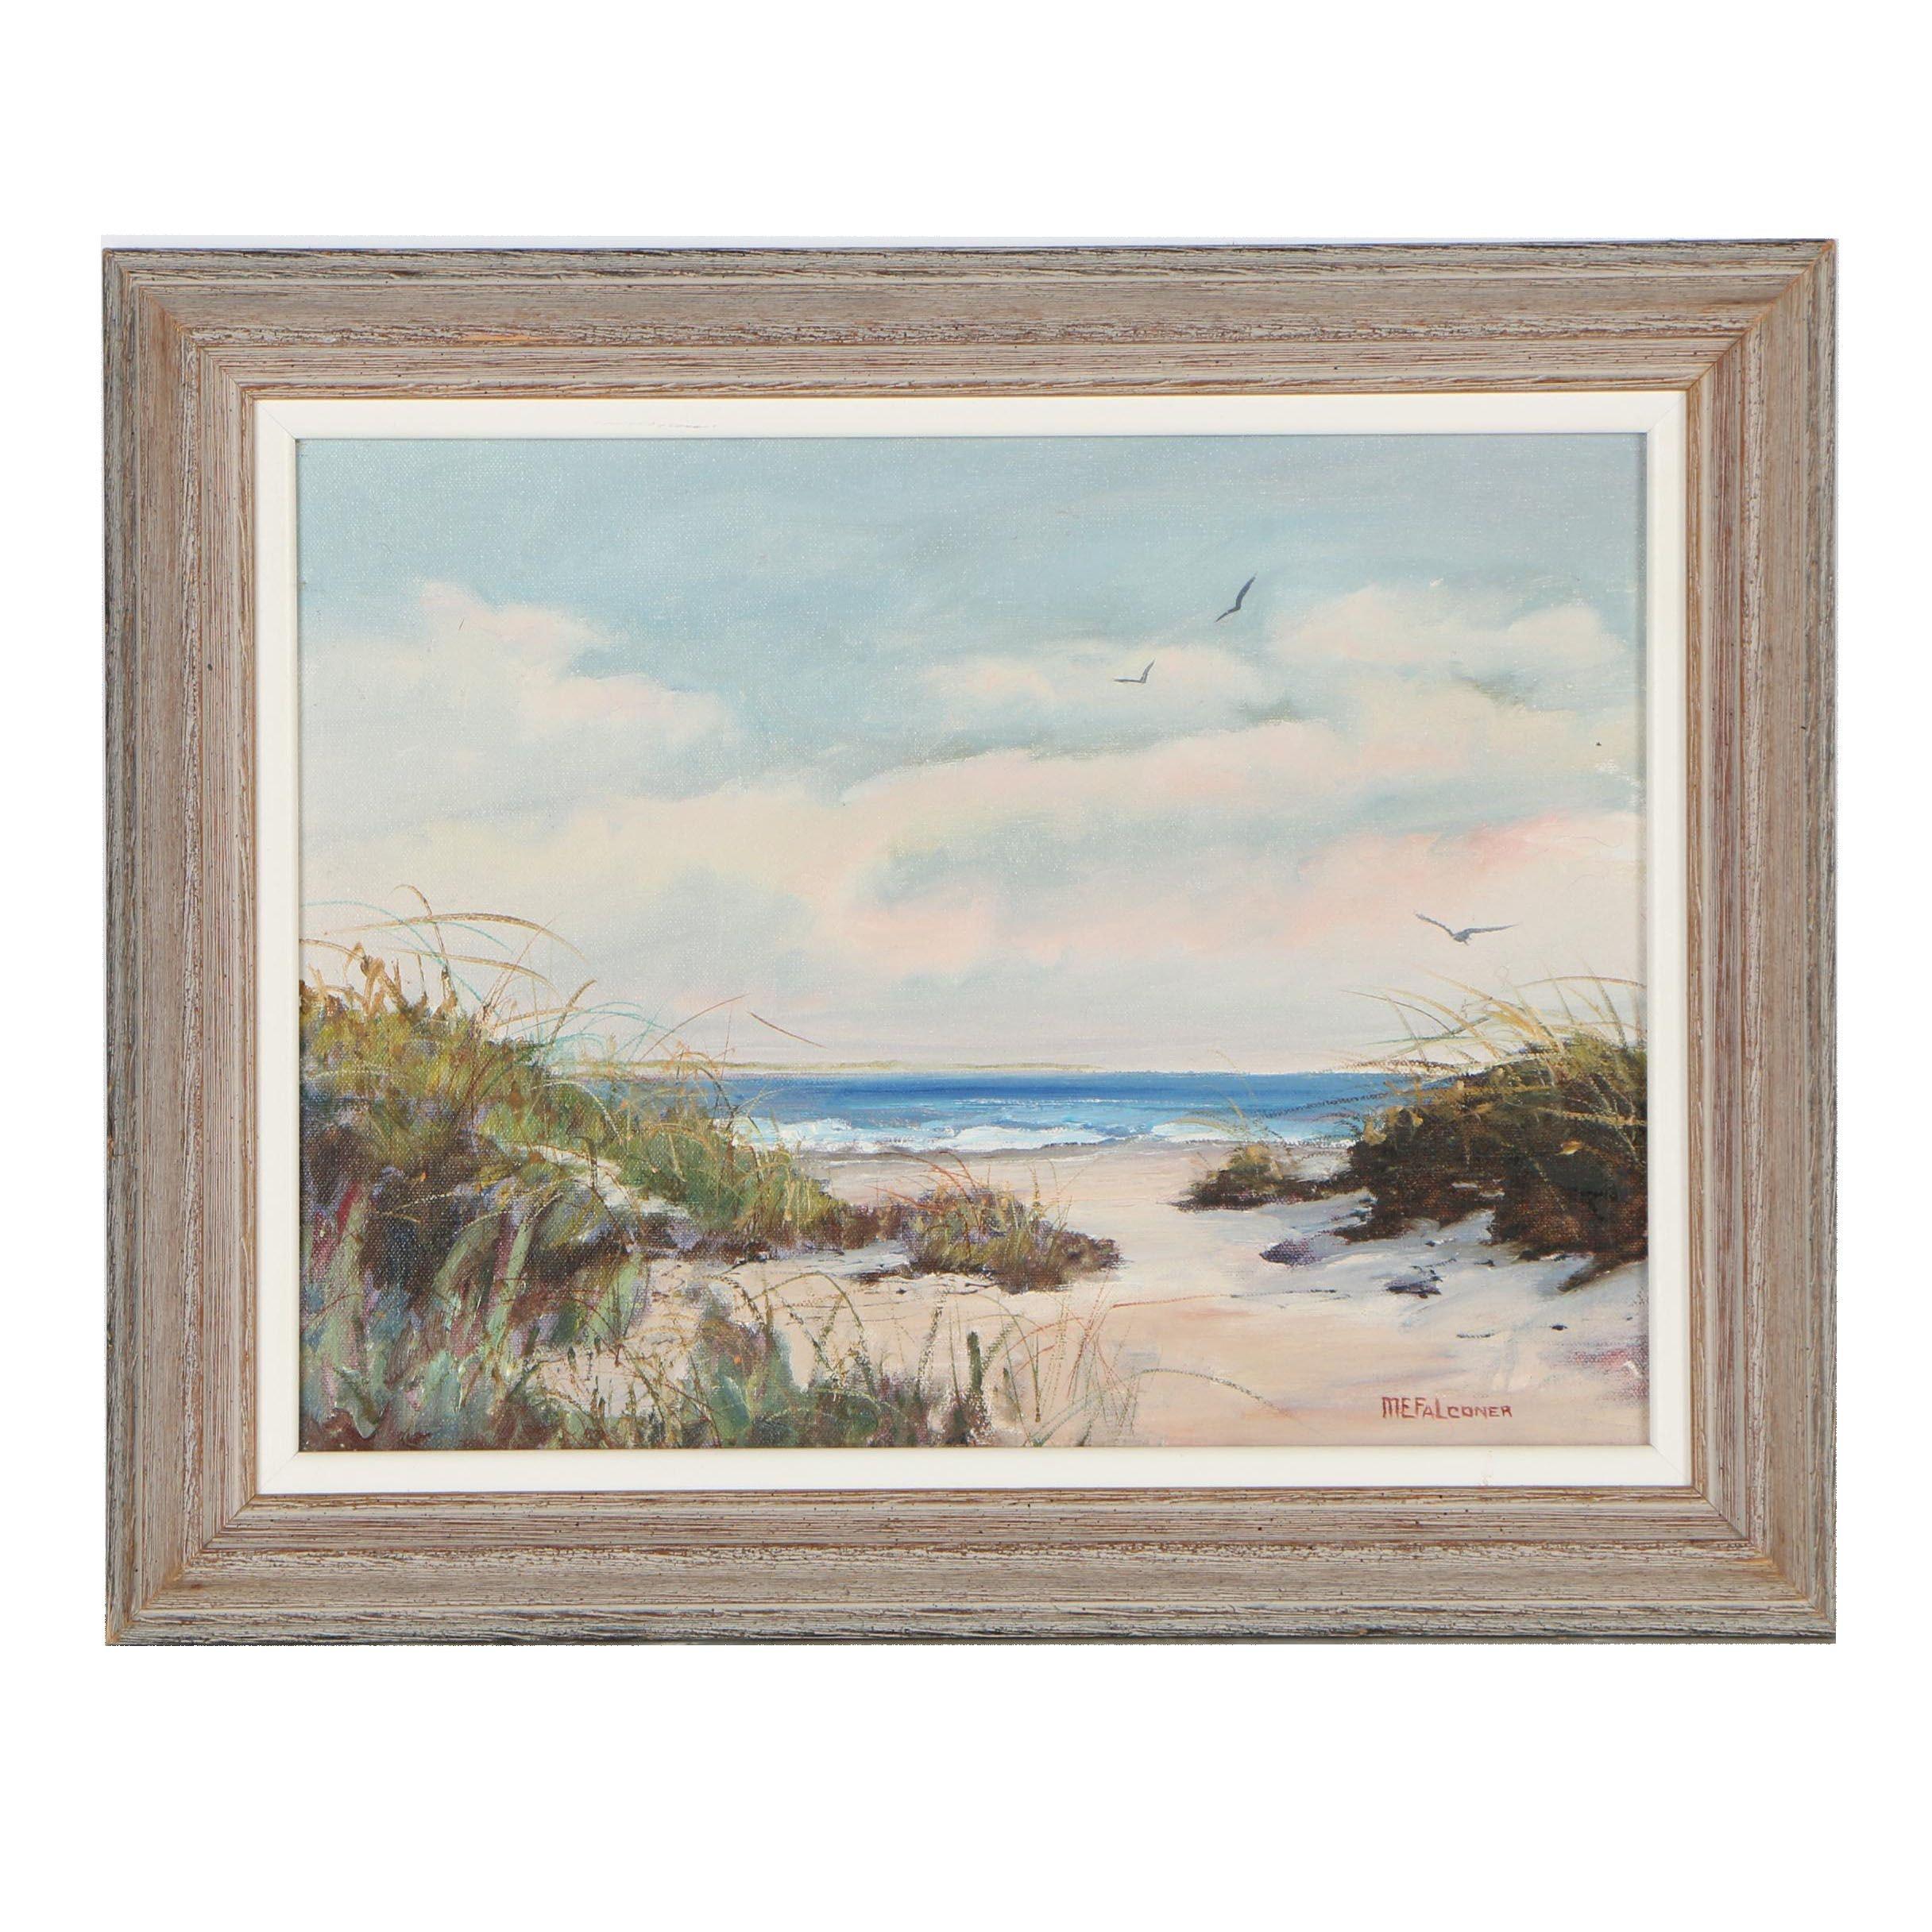 Marguerite E. Falconer Seaside Landscape Oil Painting